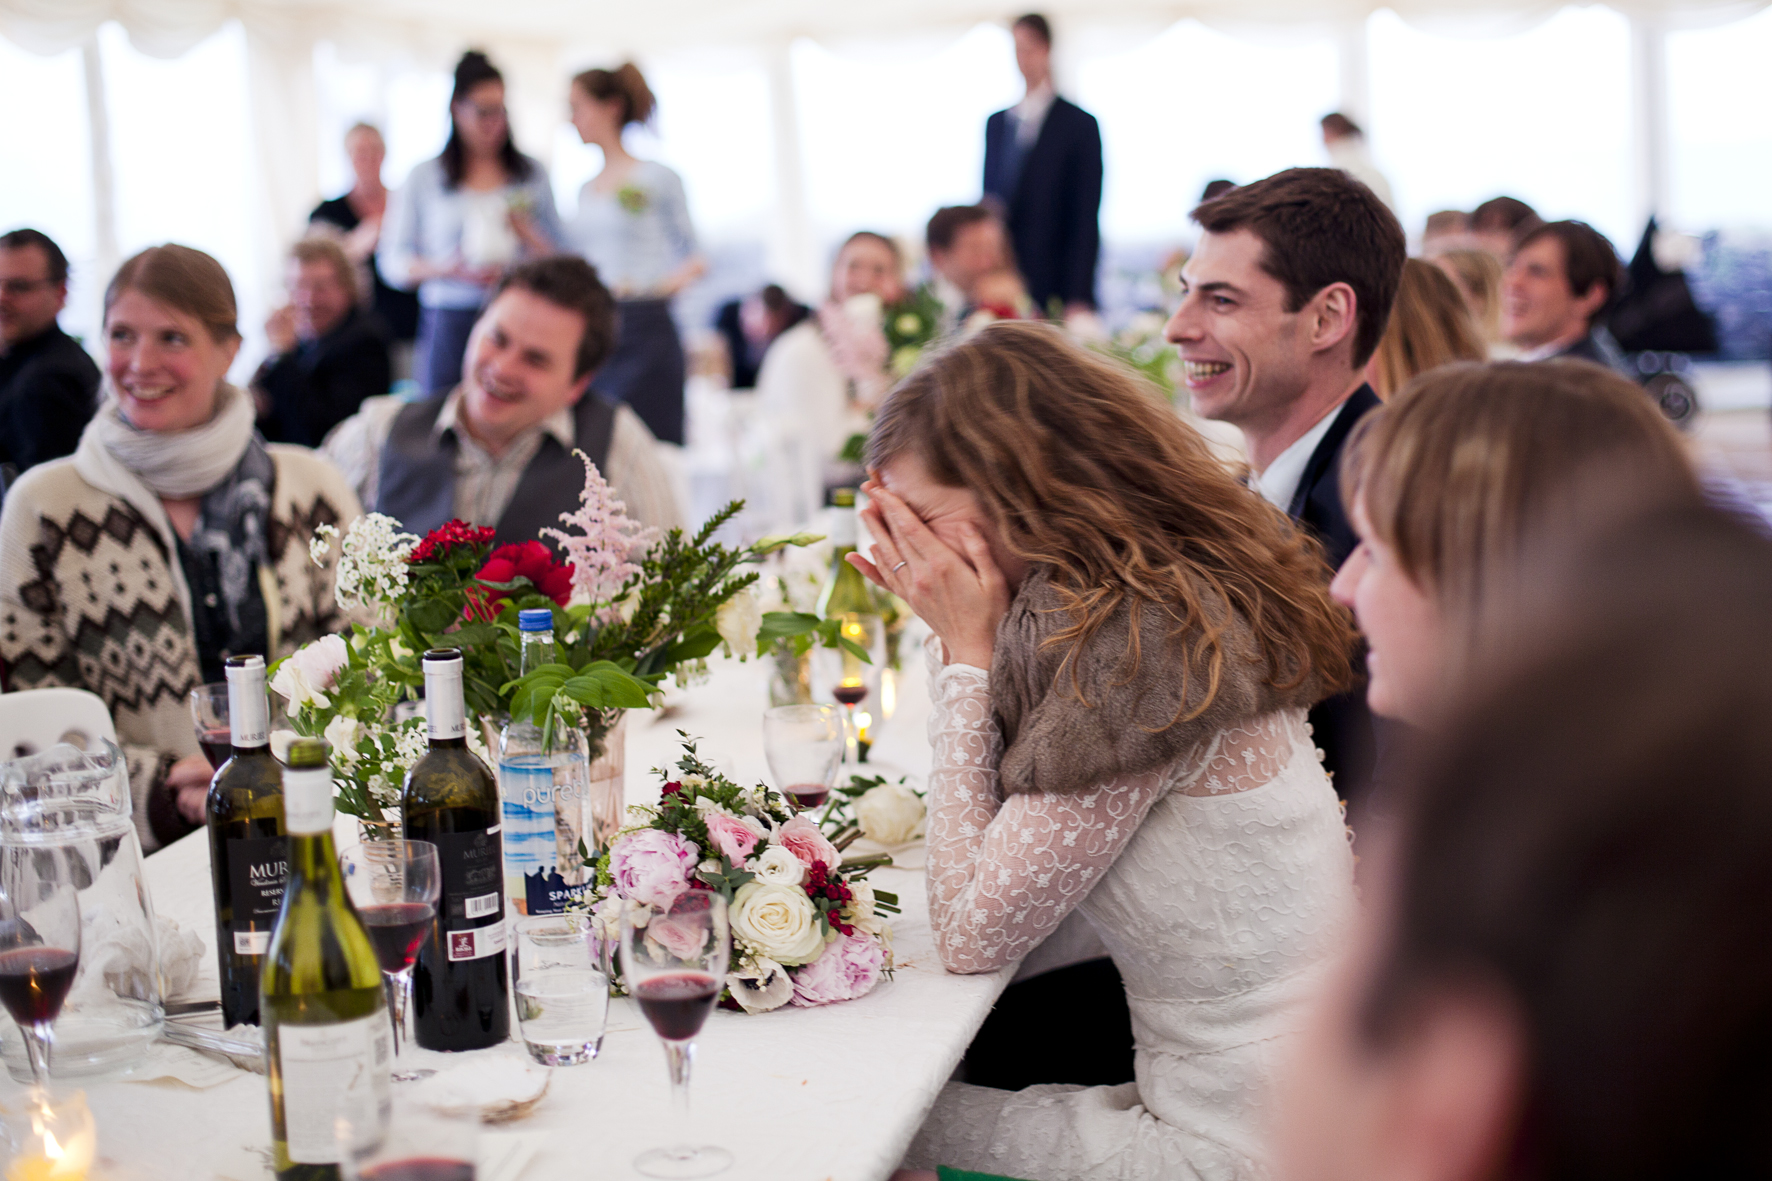 Wedding example_M&P__MG_4164-Edit_Claudia Leisinger.jpg